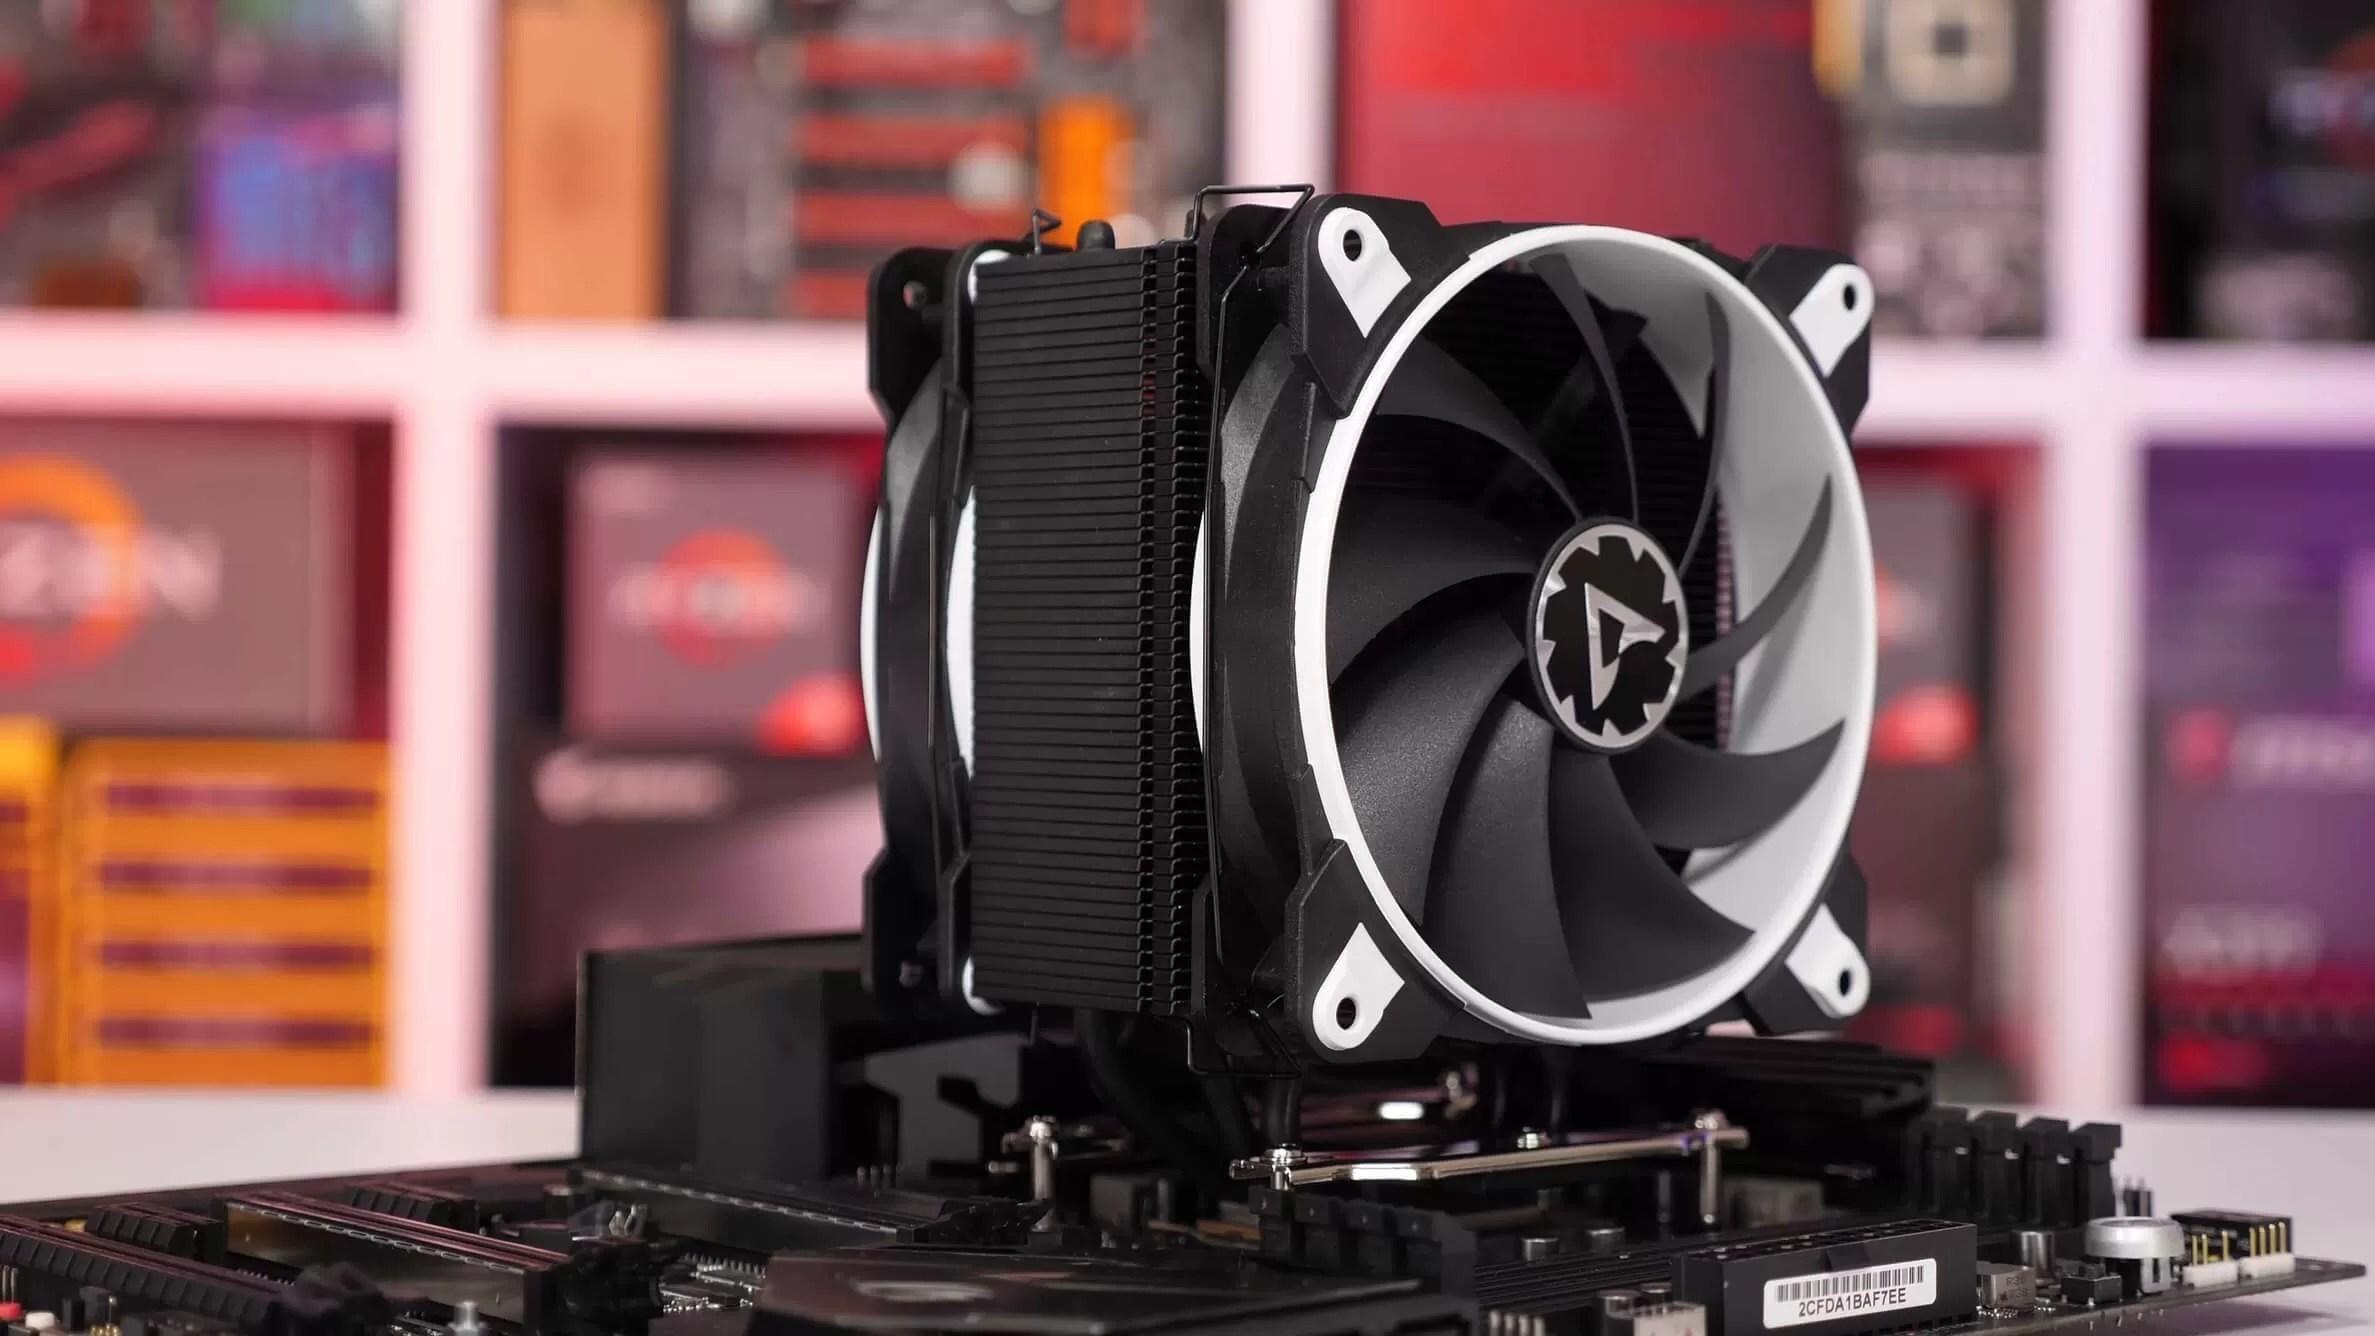 Ryzen 5 2600X vs. 2600: Which should you buy? - TechSpot